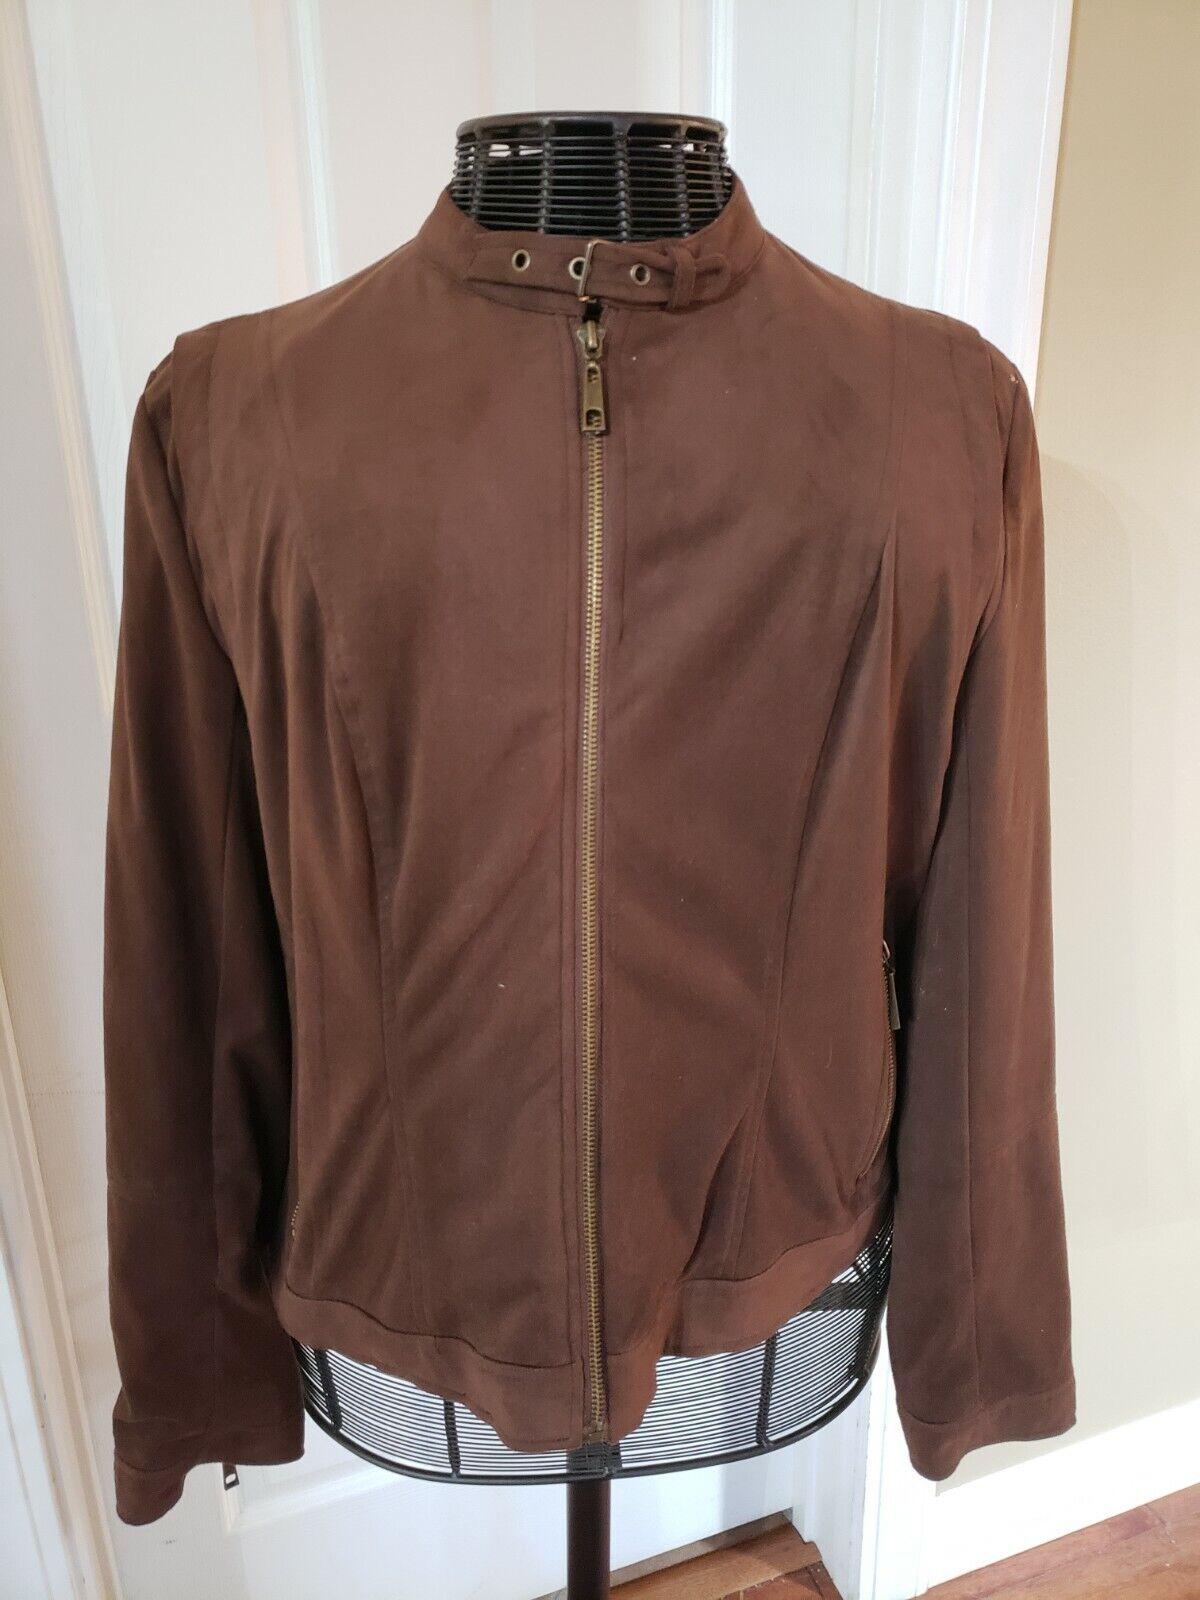 Baccini Women's Jacket size XL brown lined pockets zipper cuffs! EUC!